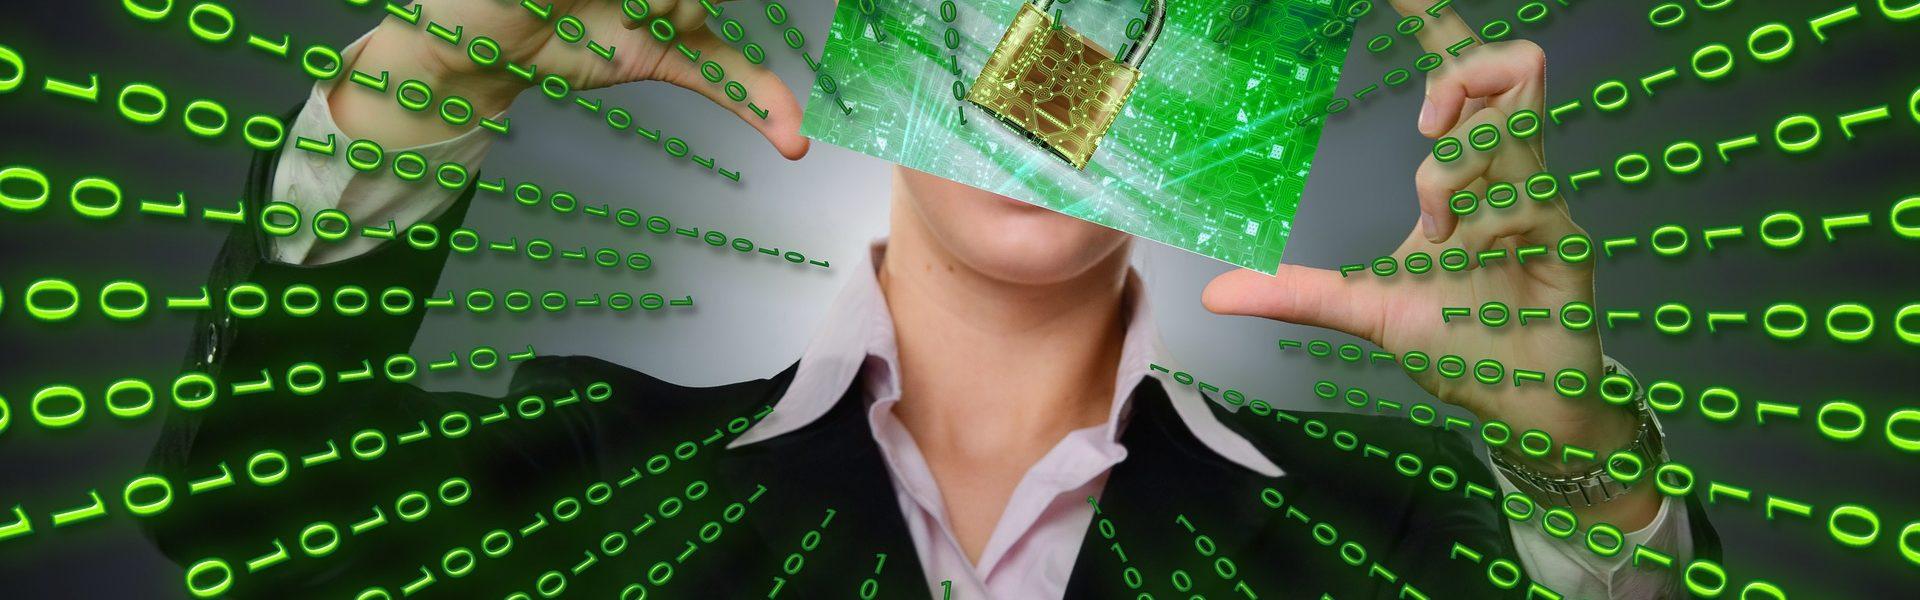 Ochrona danych osobowych